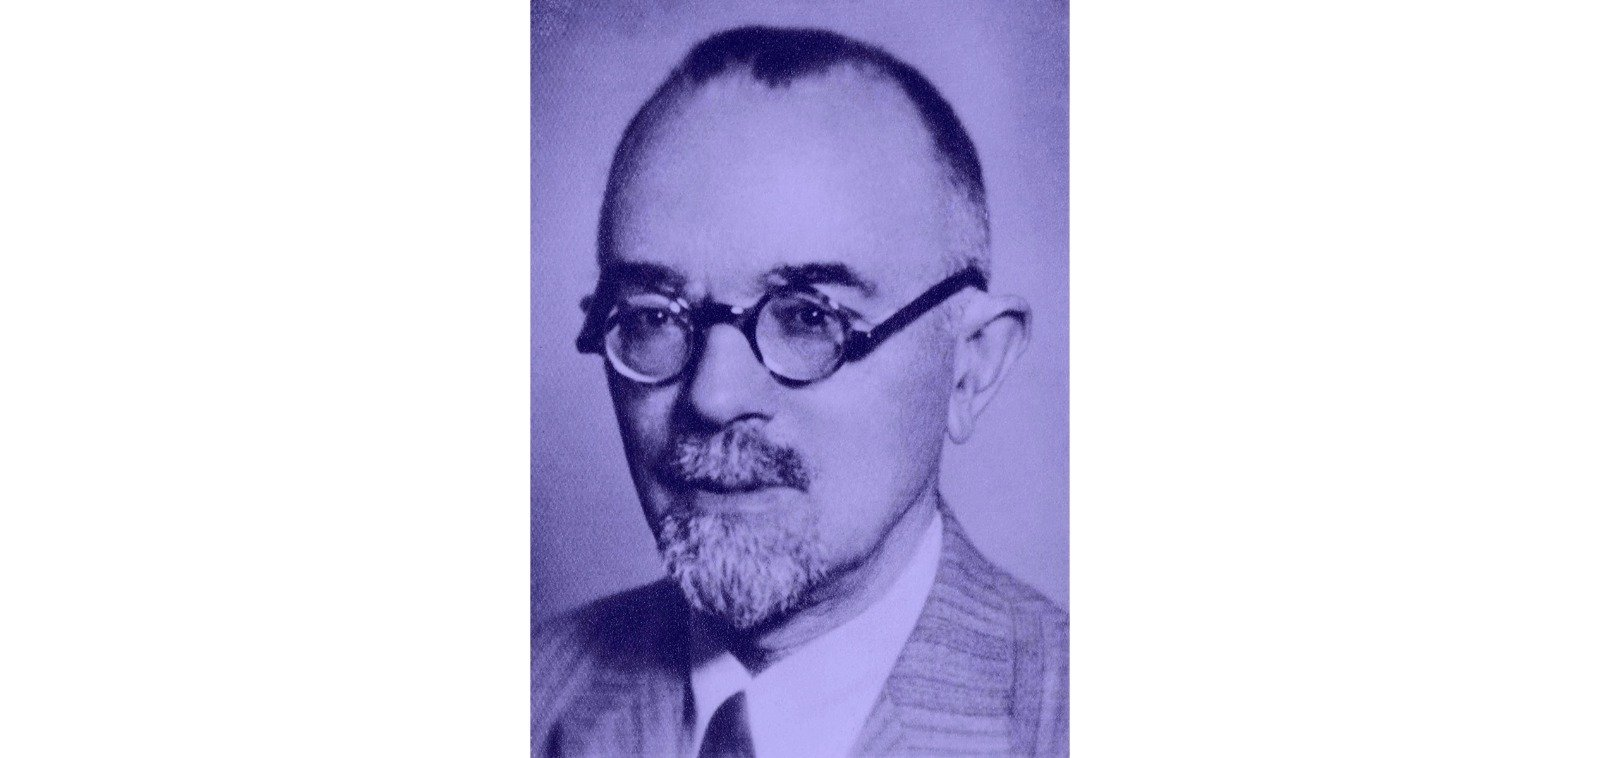 Mehmet Ali Ayni supported a spiritualist conservatism against positivism.